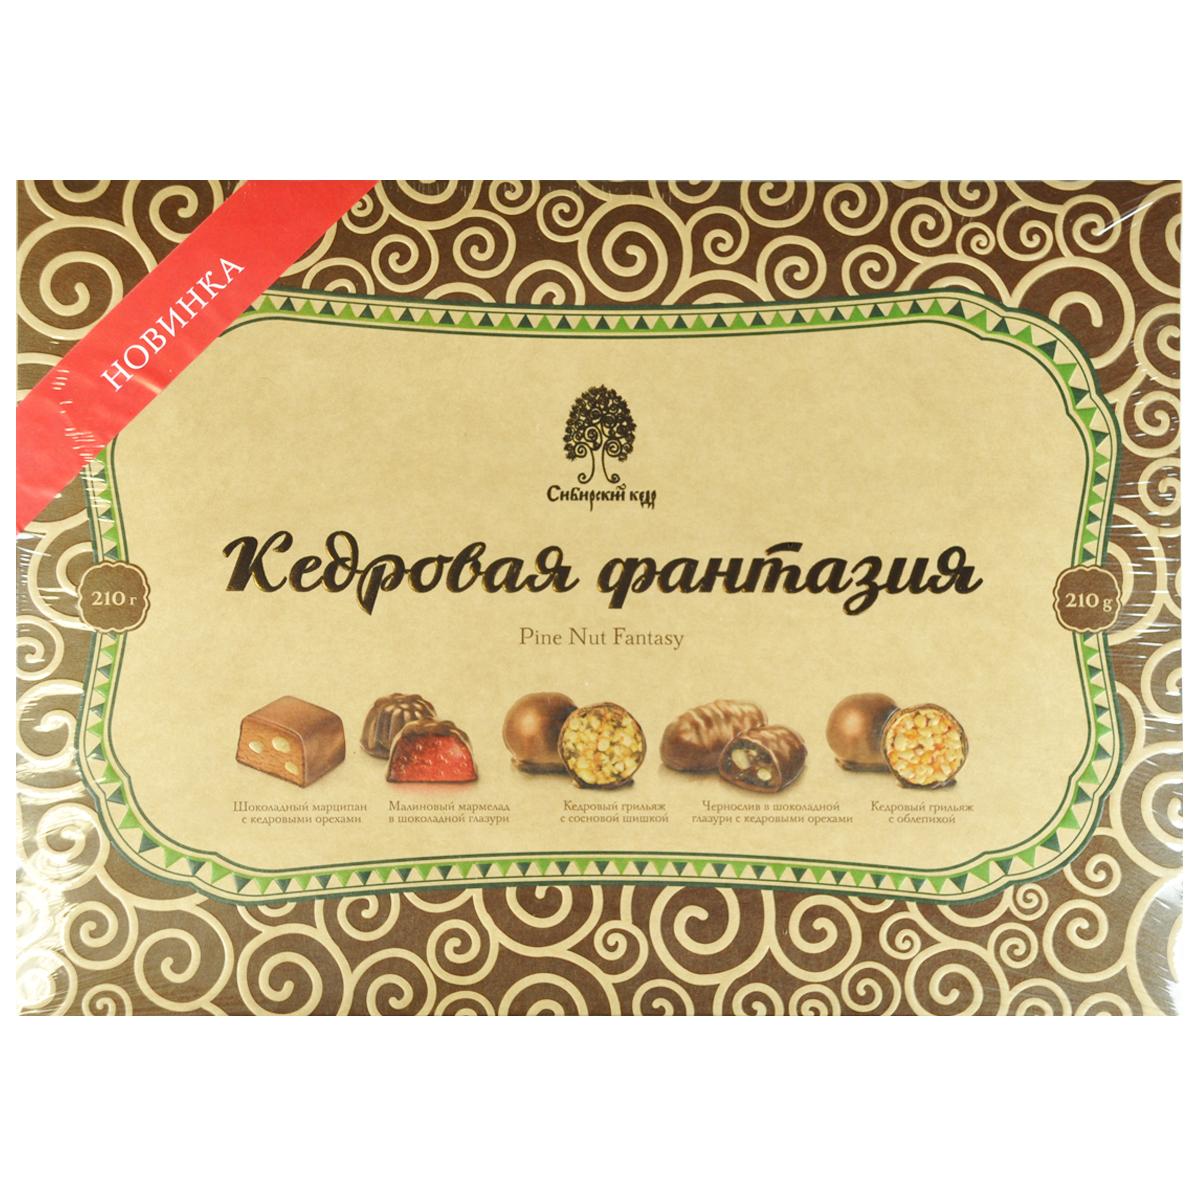 Сибирский Кедр конфеты кедровая фантазия ассорти, 210 г конфеты jelly belly 100g